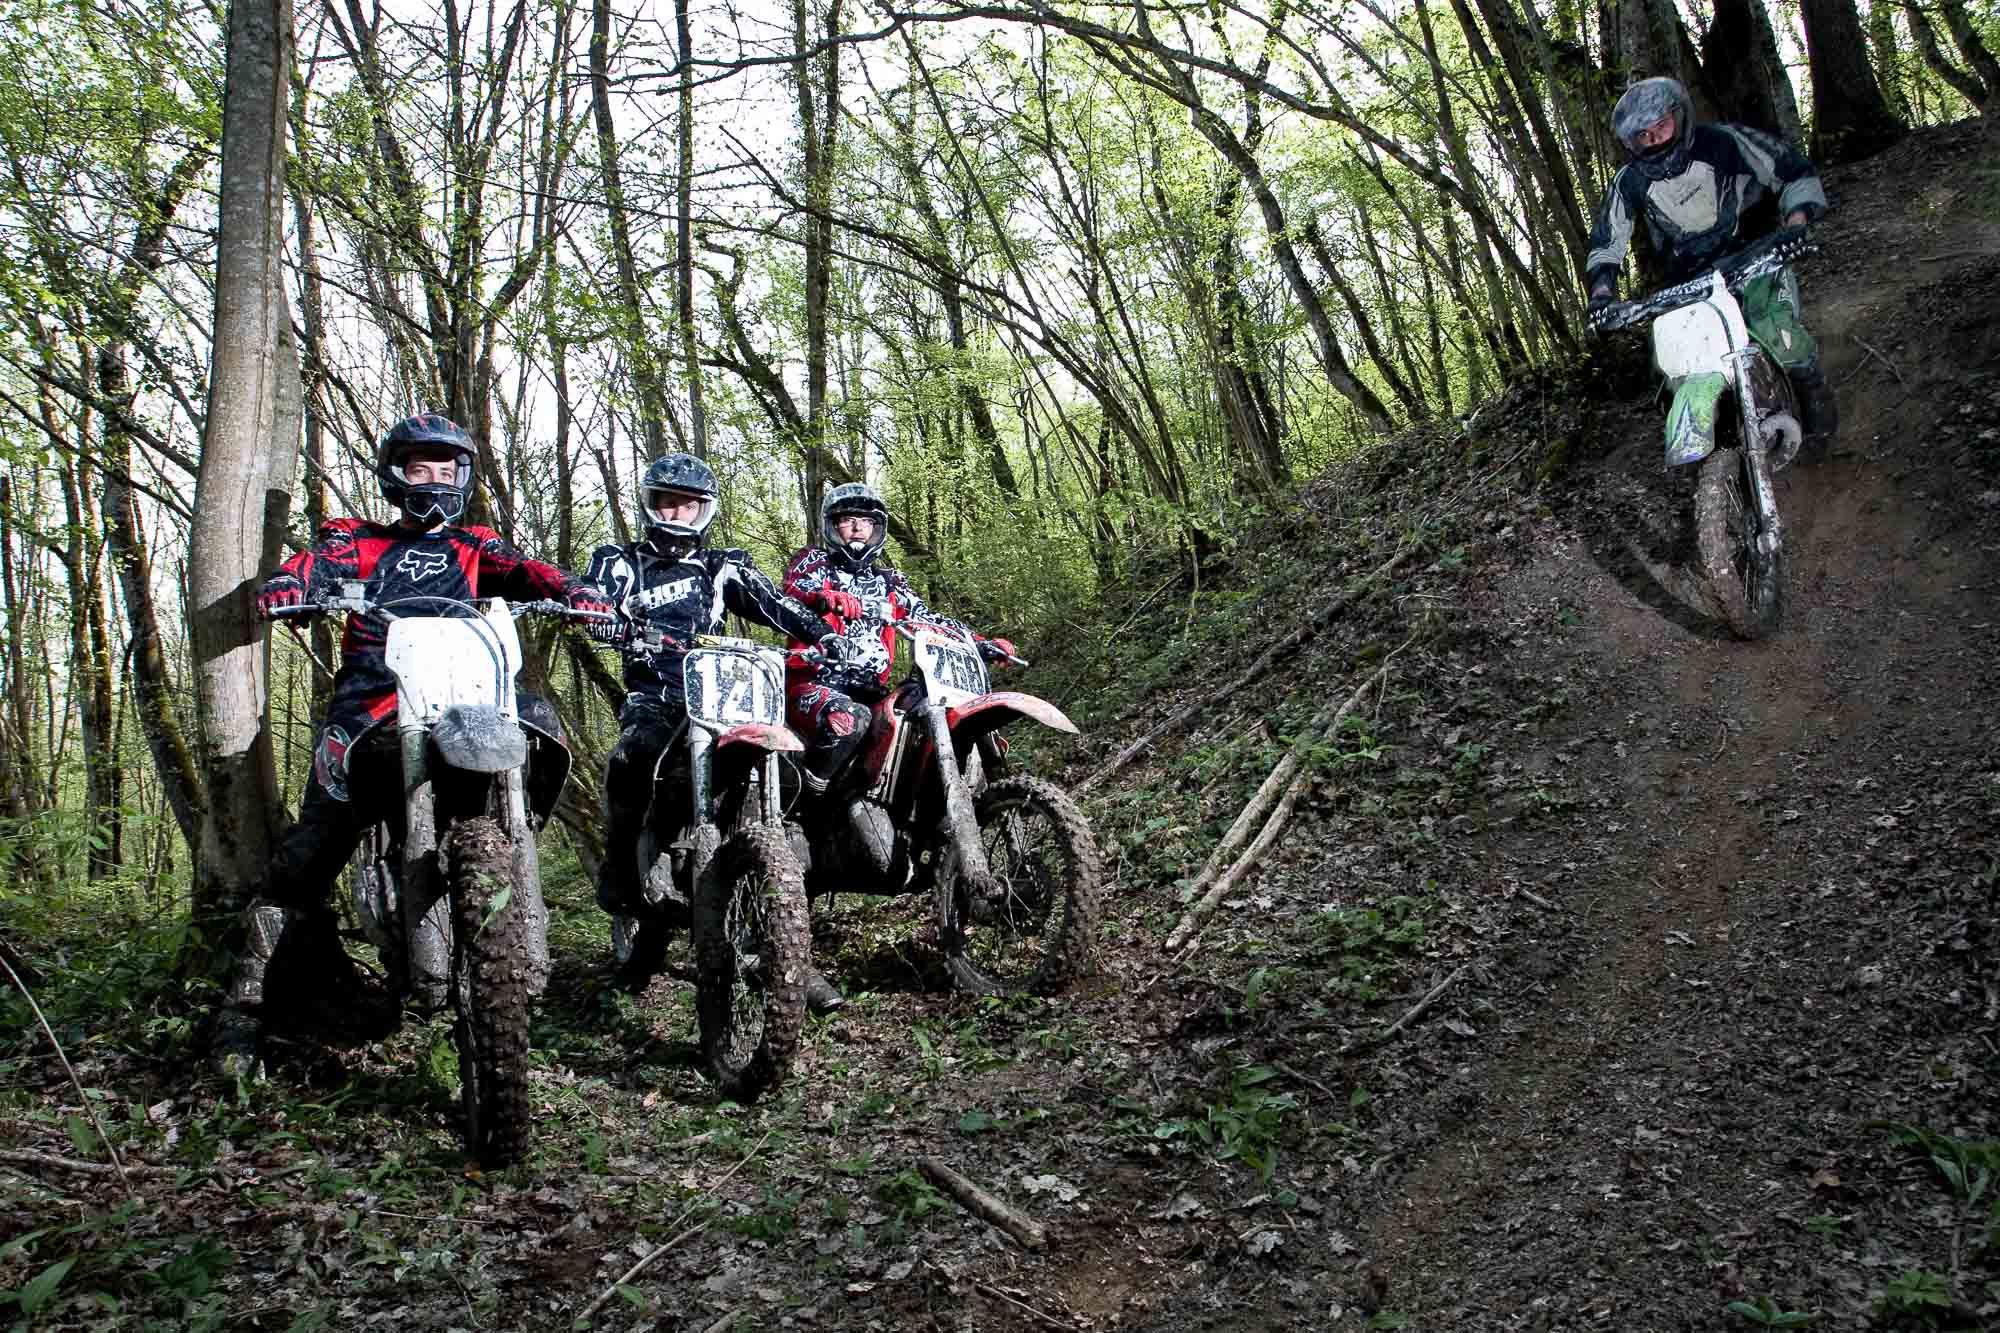 20100425-motos yvoire-38.jpg